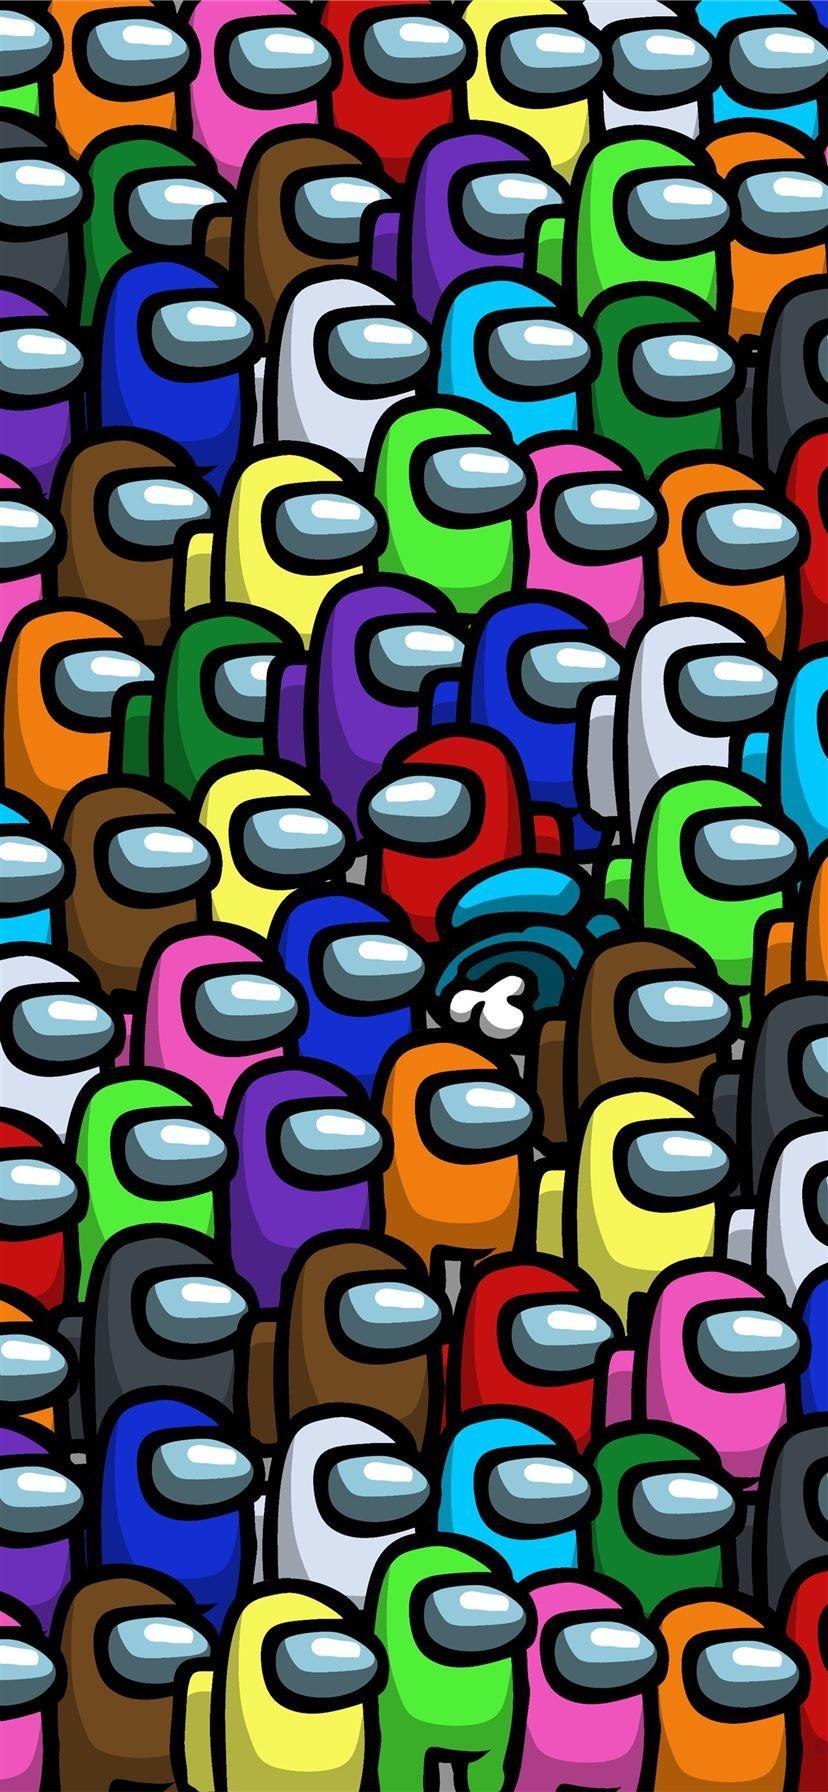 Among Us I Made Phone Amongus Trends Iphone11wallpaper Wallpaper Iphone Cute Pretty Wallpaper Iphone Pretty Wallpapers